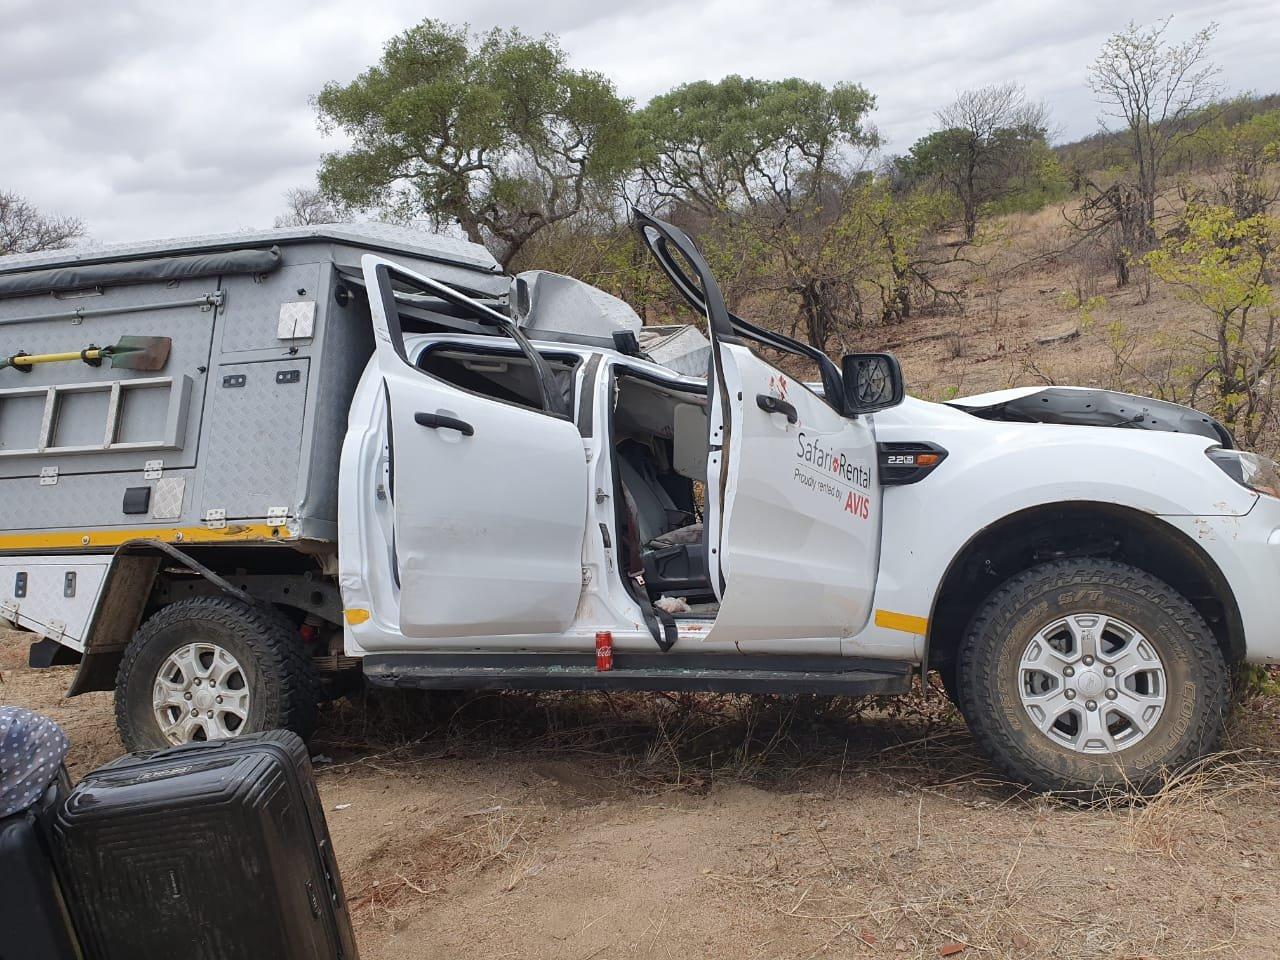 safari vehicle kruger park south africa giraffe accident